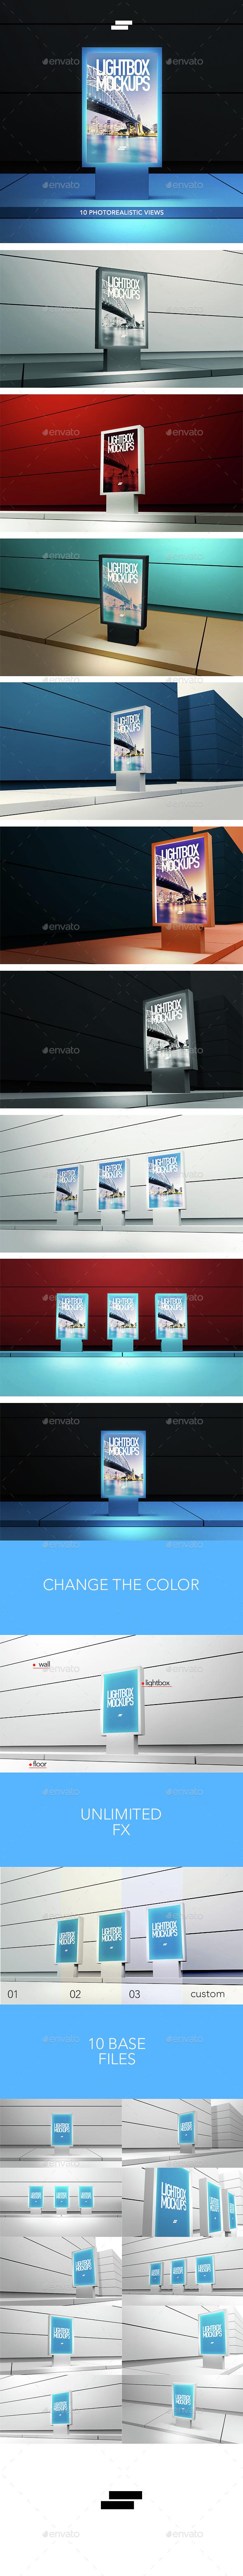 3D Lightbox Poster Outdoor Mock-ups - Signage Print